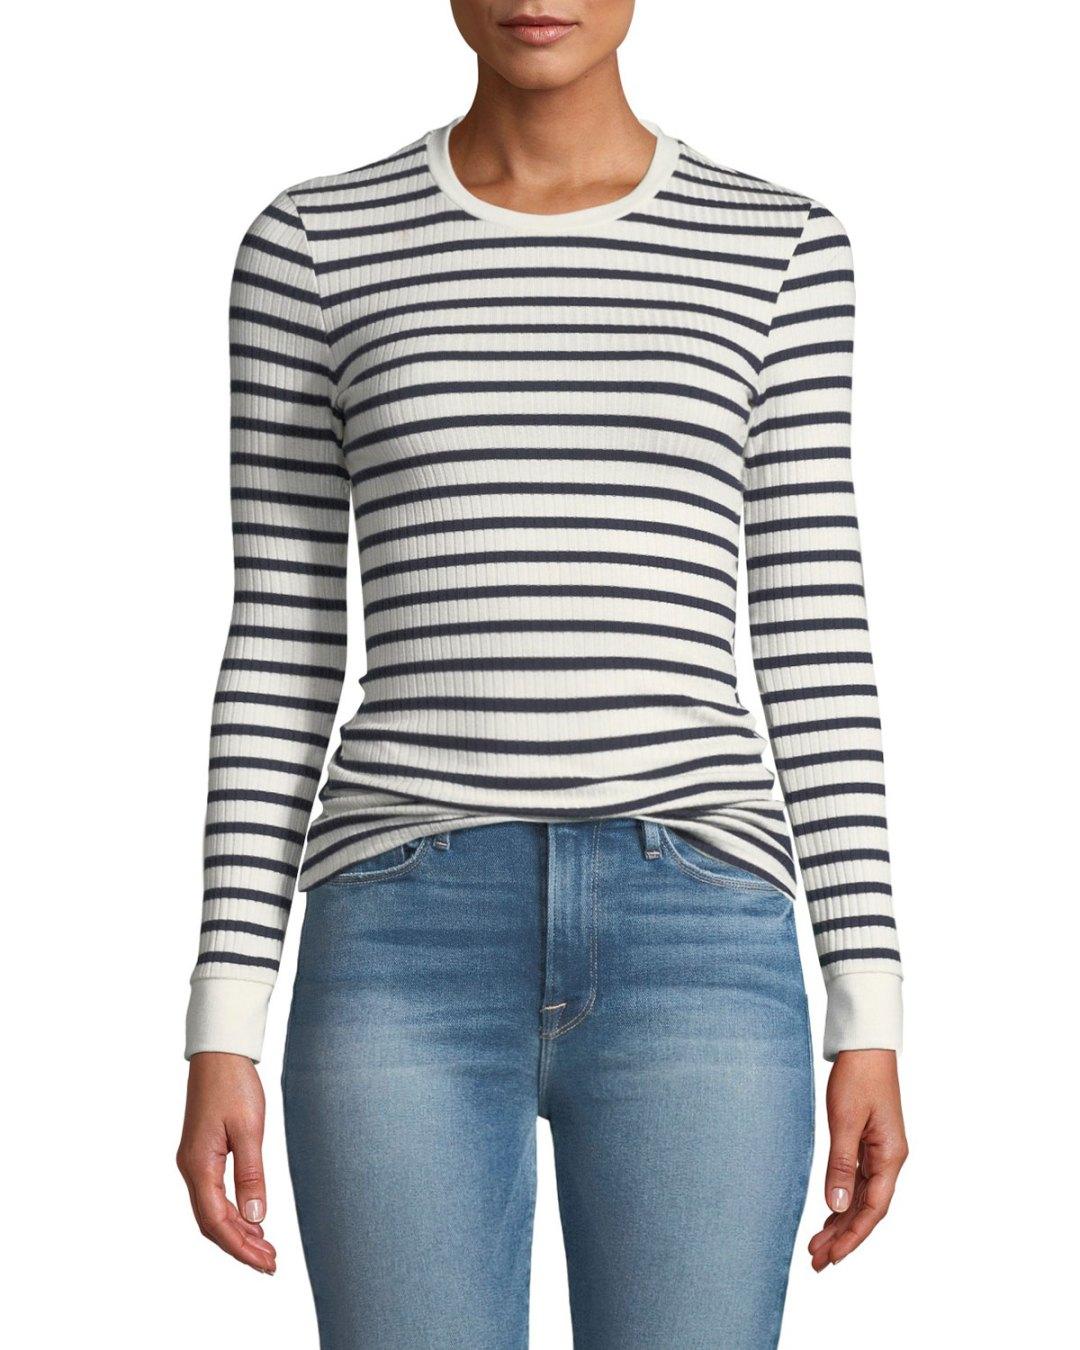 466435640f5 Neiman Marcus – Striped Rib-Knit Long-Sleeve Top – $135.00